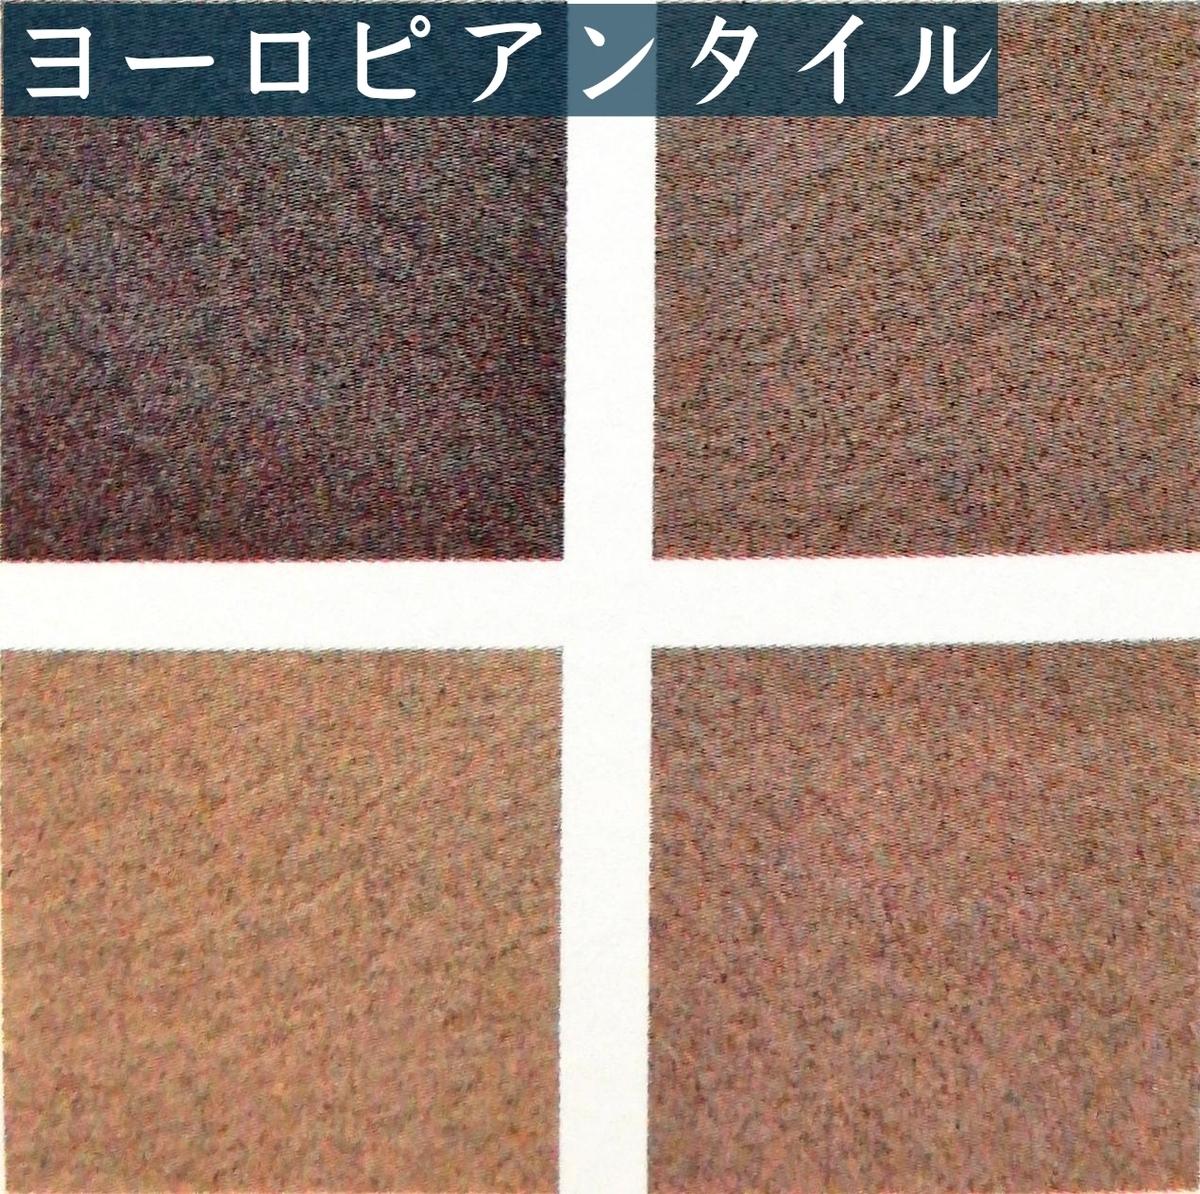 f:id:shioyan1130:20210306075808j:plain